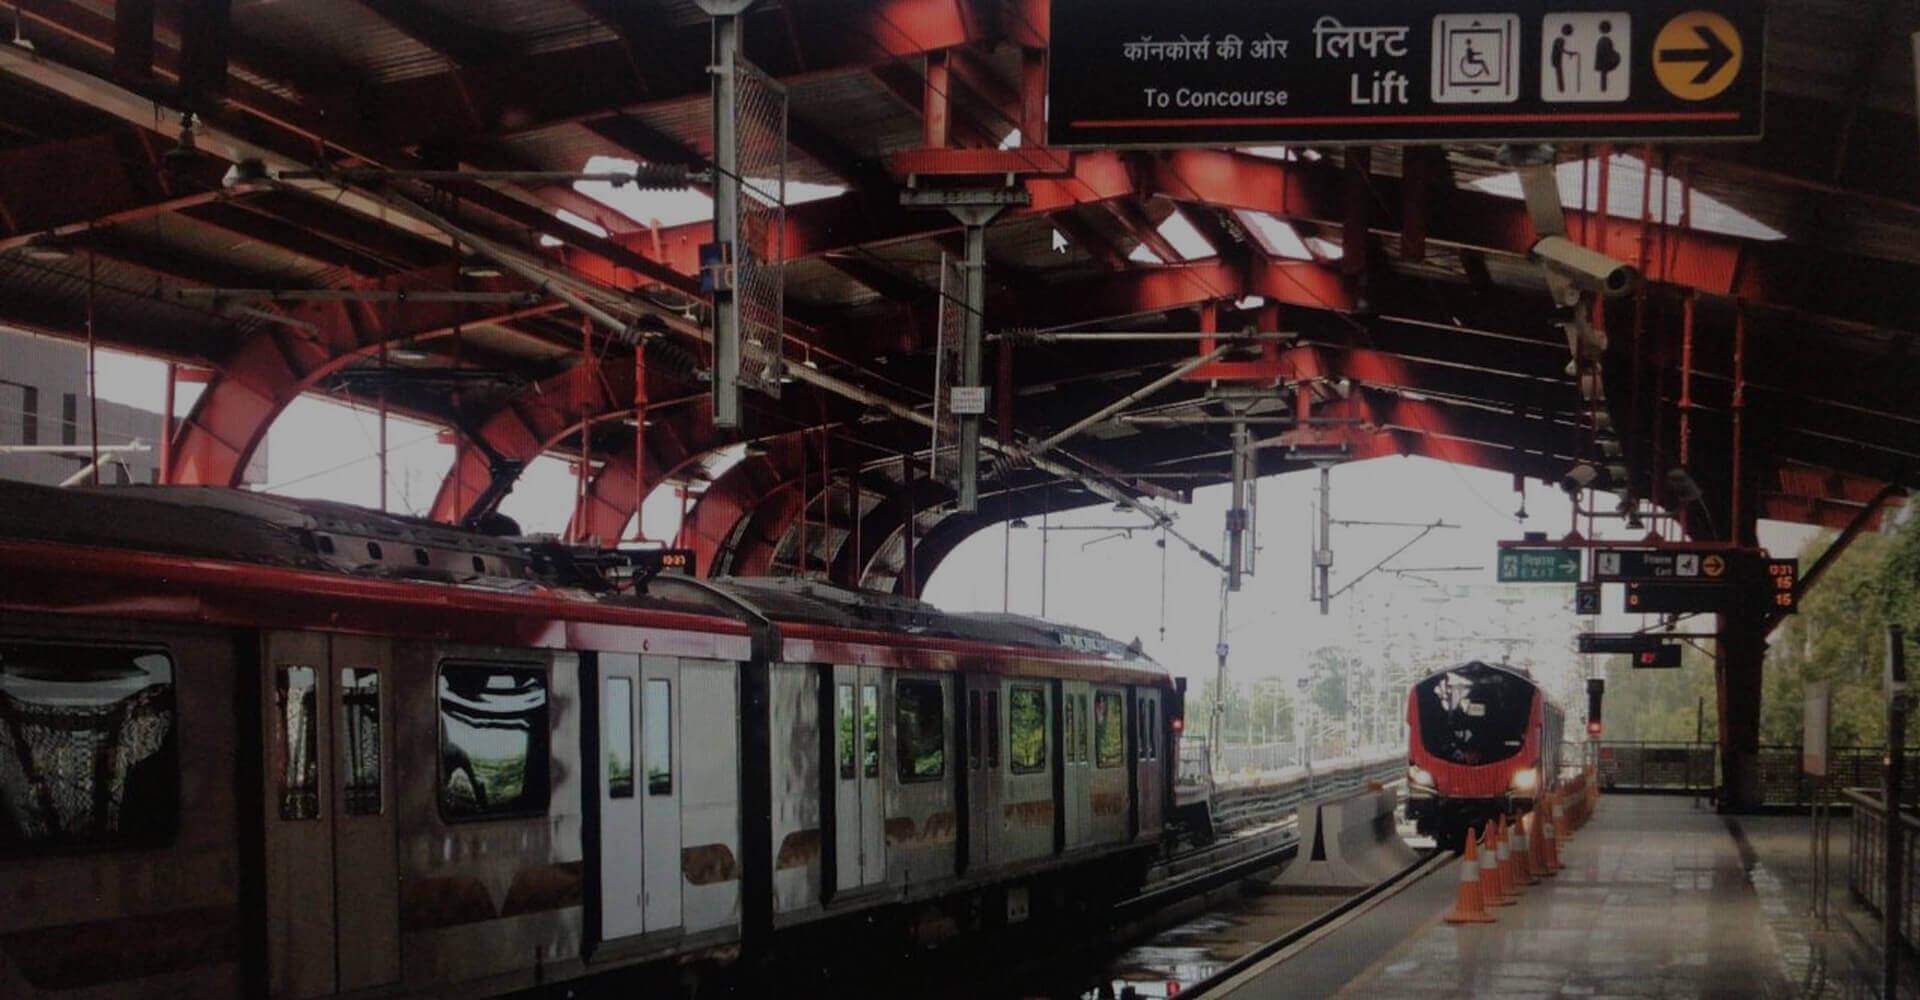 Metro construction companies in India